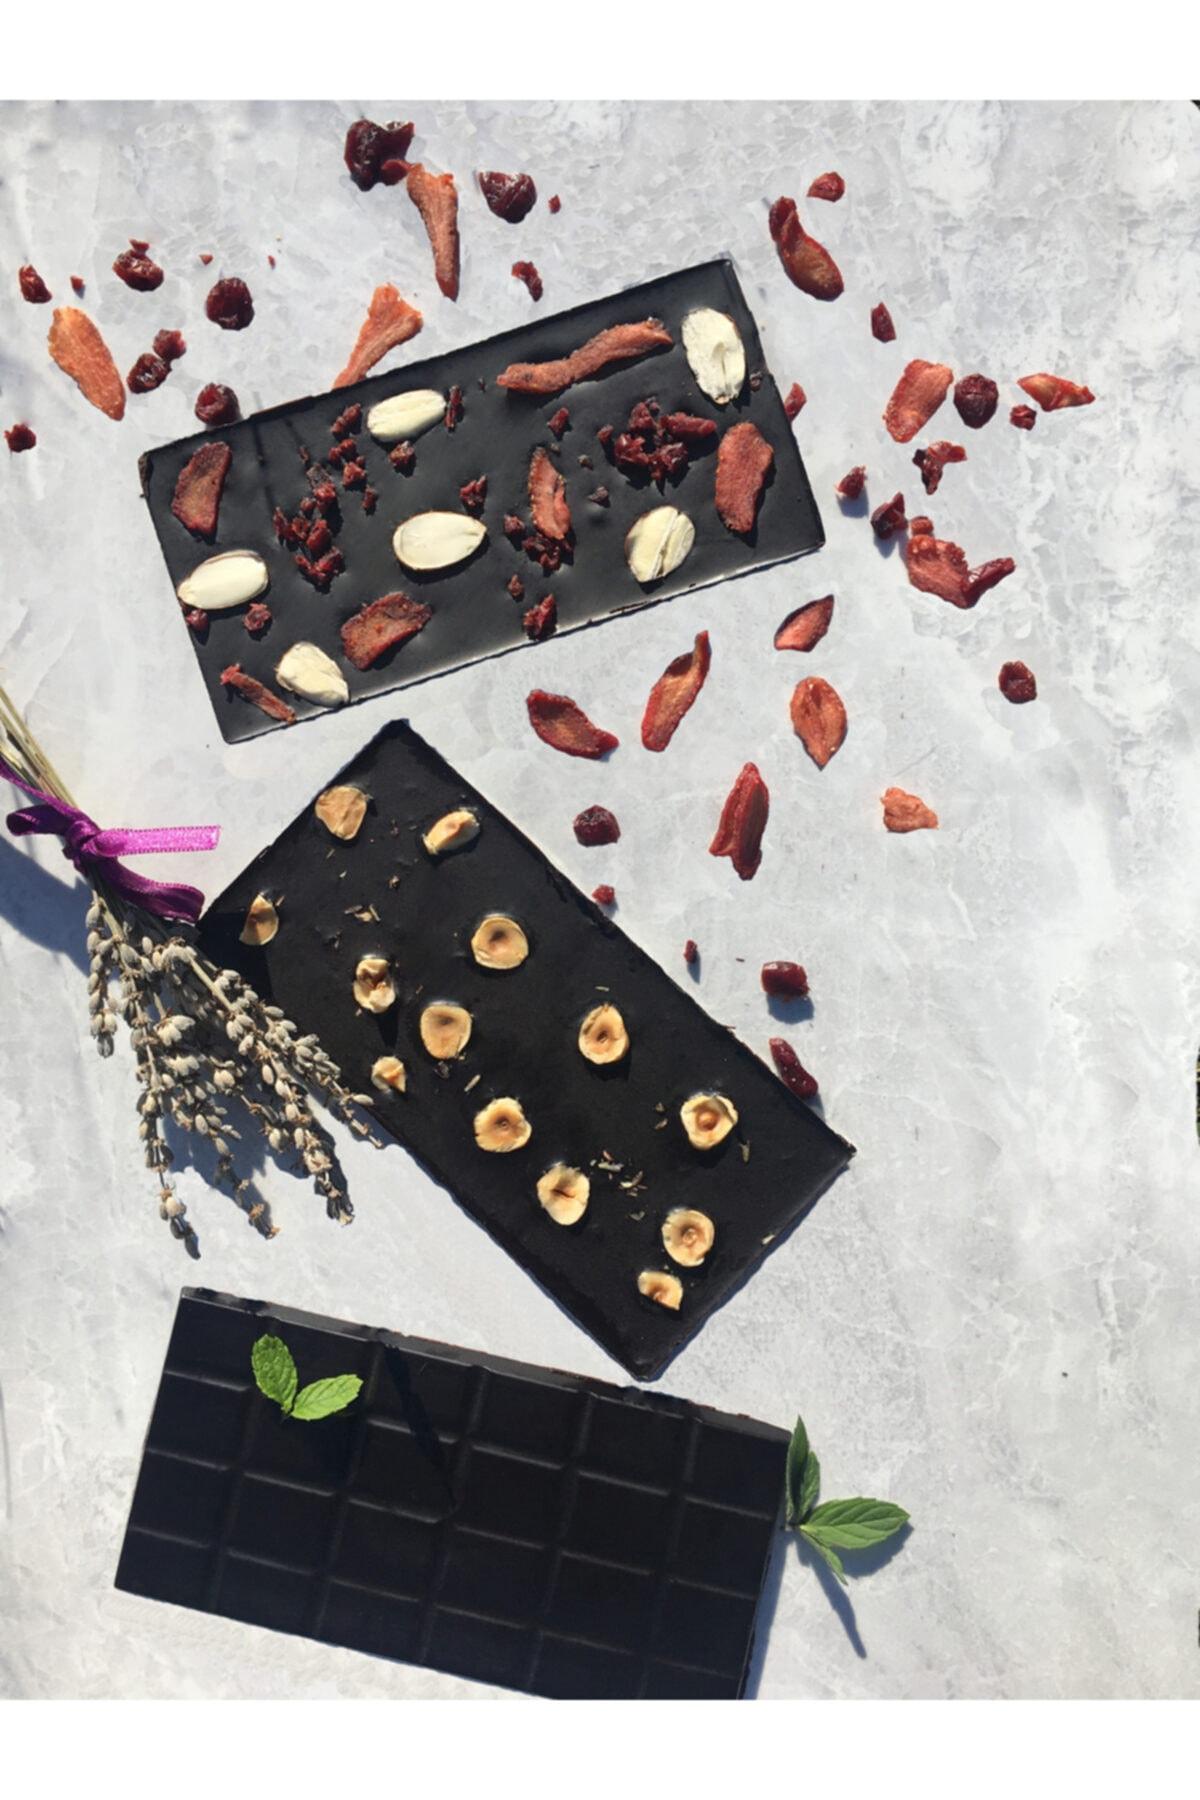 Dolc'ida 3'lü Vegan Çikolata Serisi (3*100gr Baton) 1